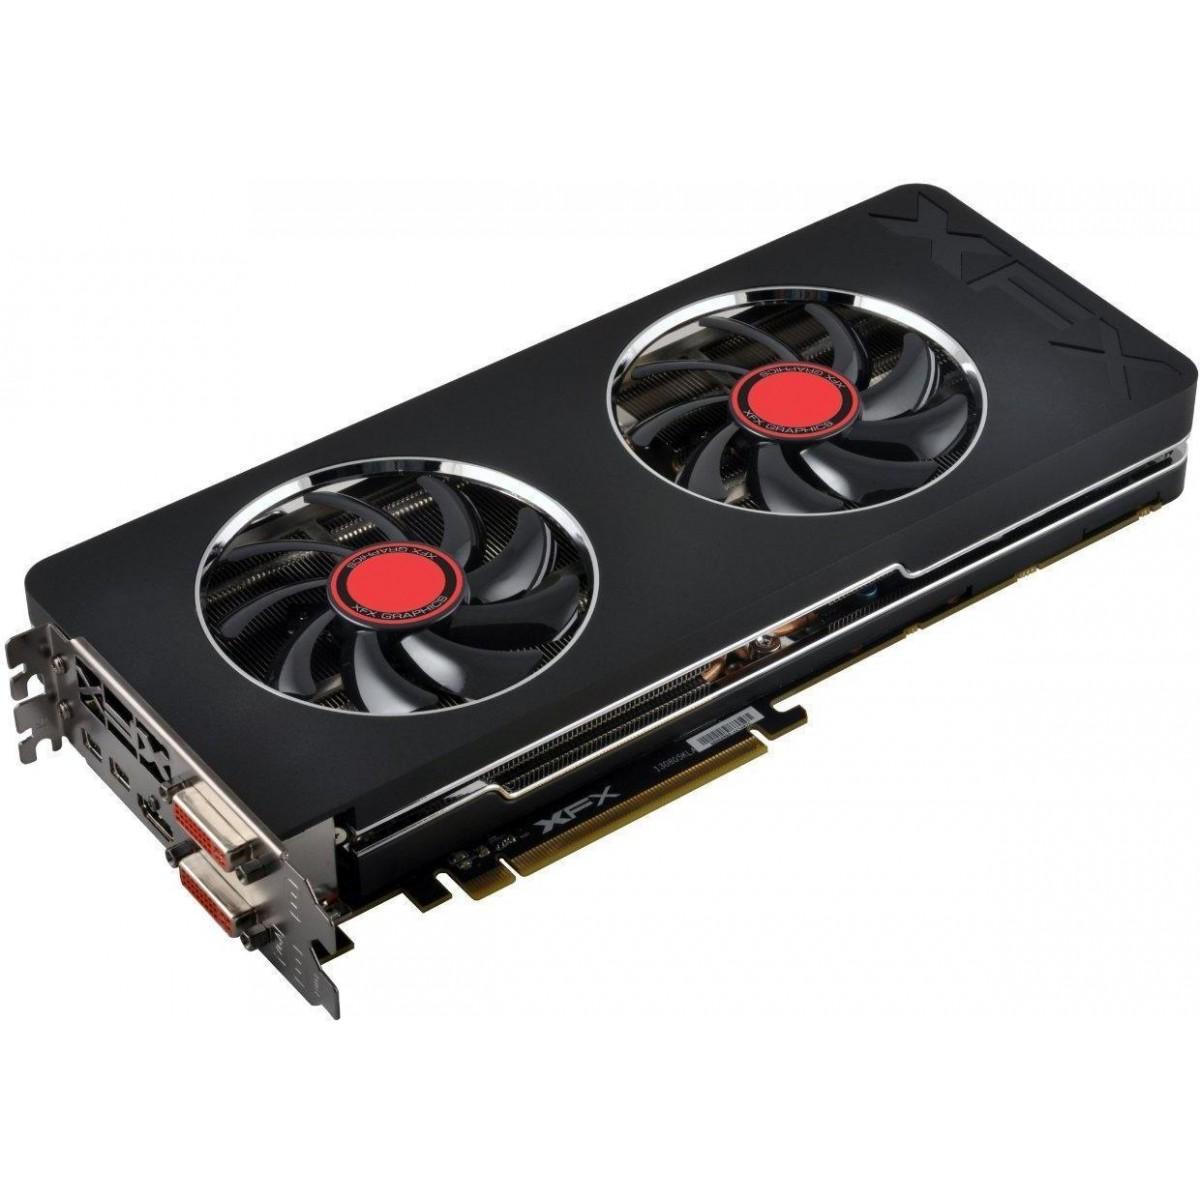 Placa de Video ATI R9 280 3GB DDR5 384Bits Double Dissipation Edition R9-280A-TDFD - XFX